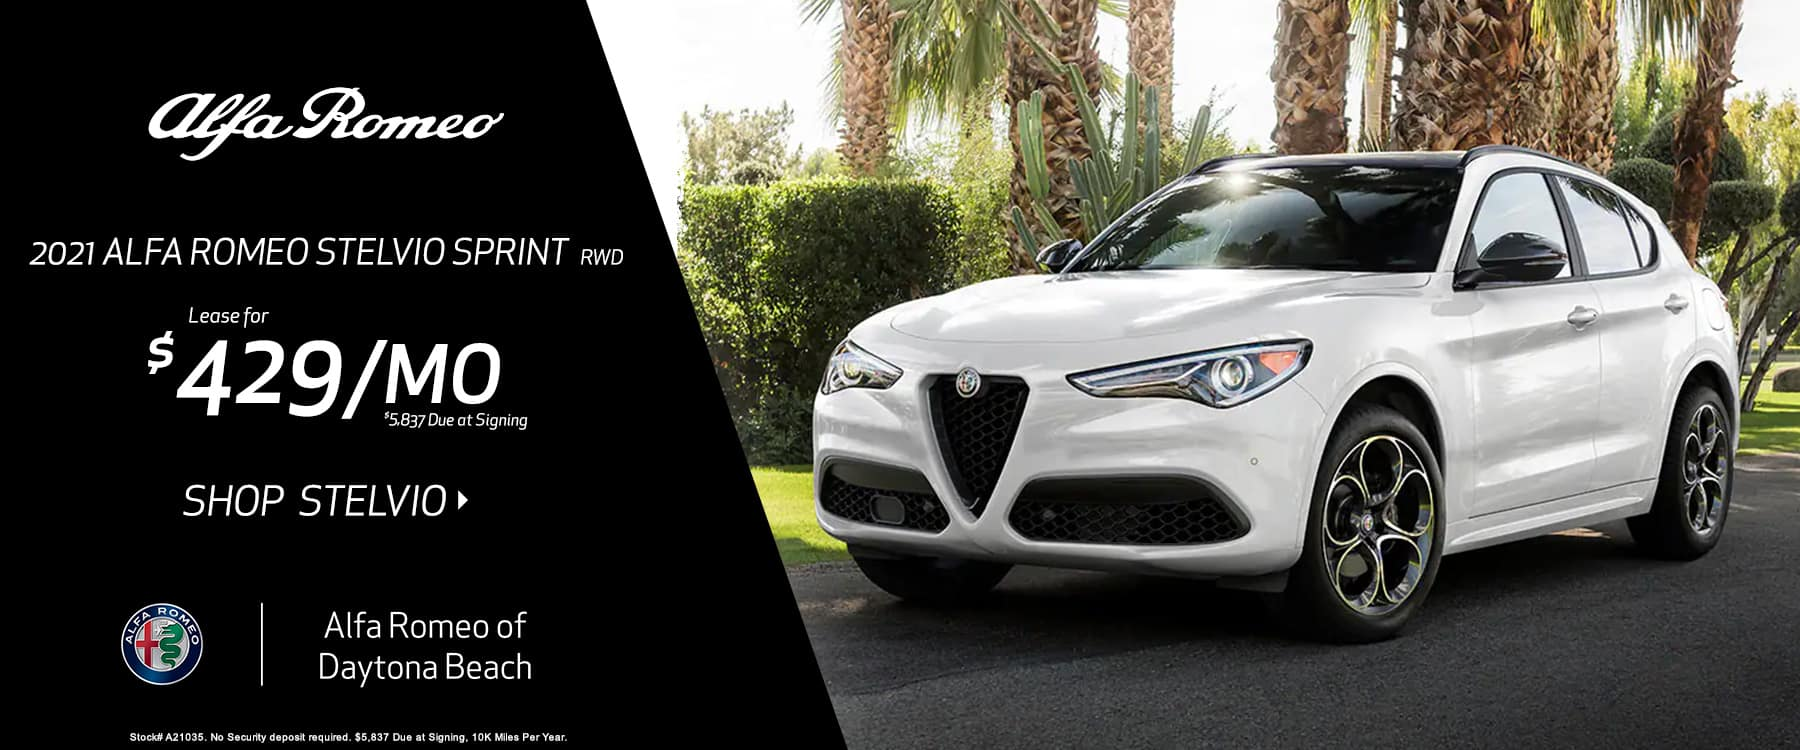 DMAR-2109-Alfa-Romeo-1800×750-02